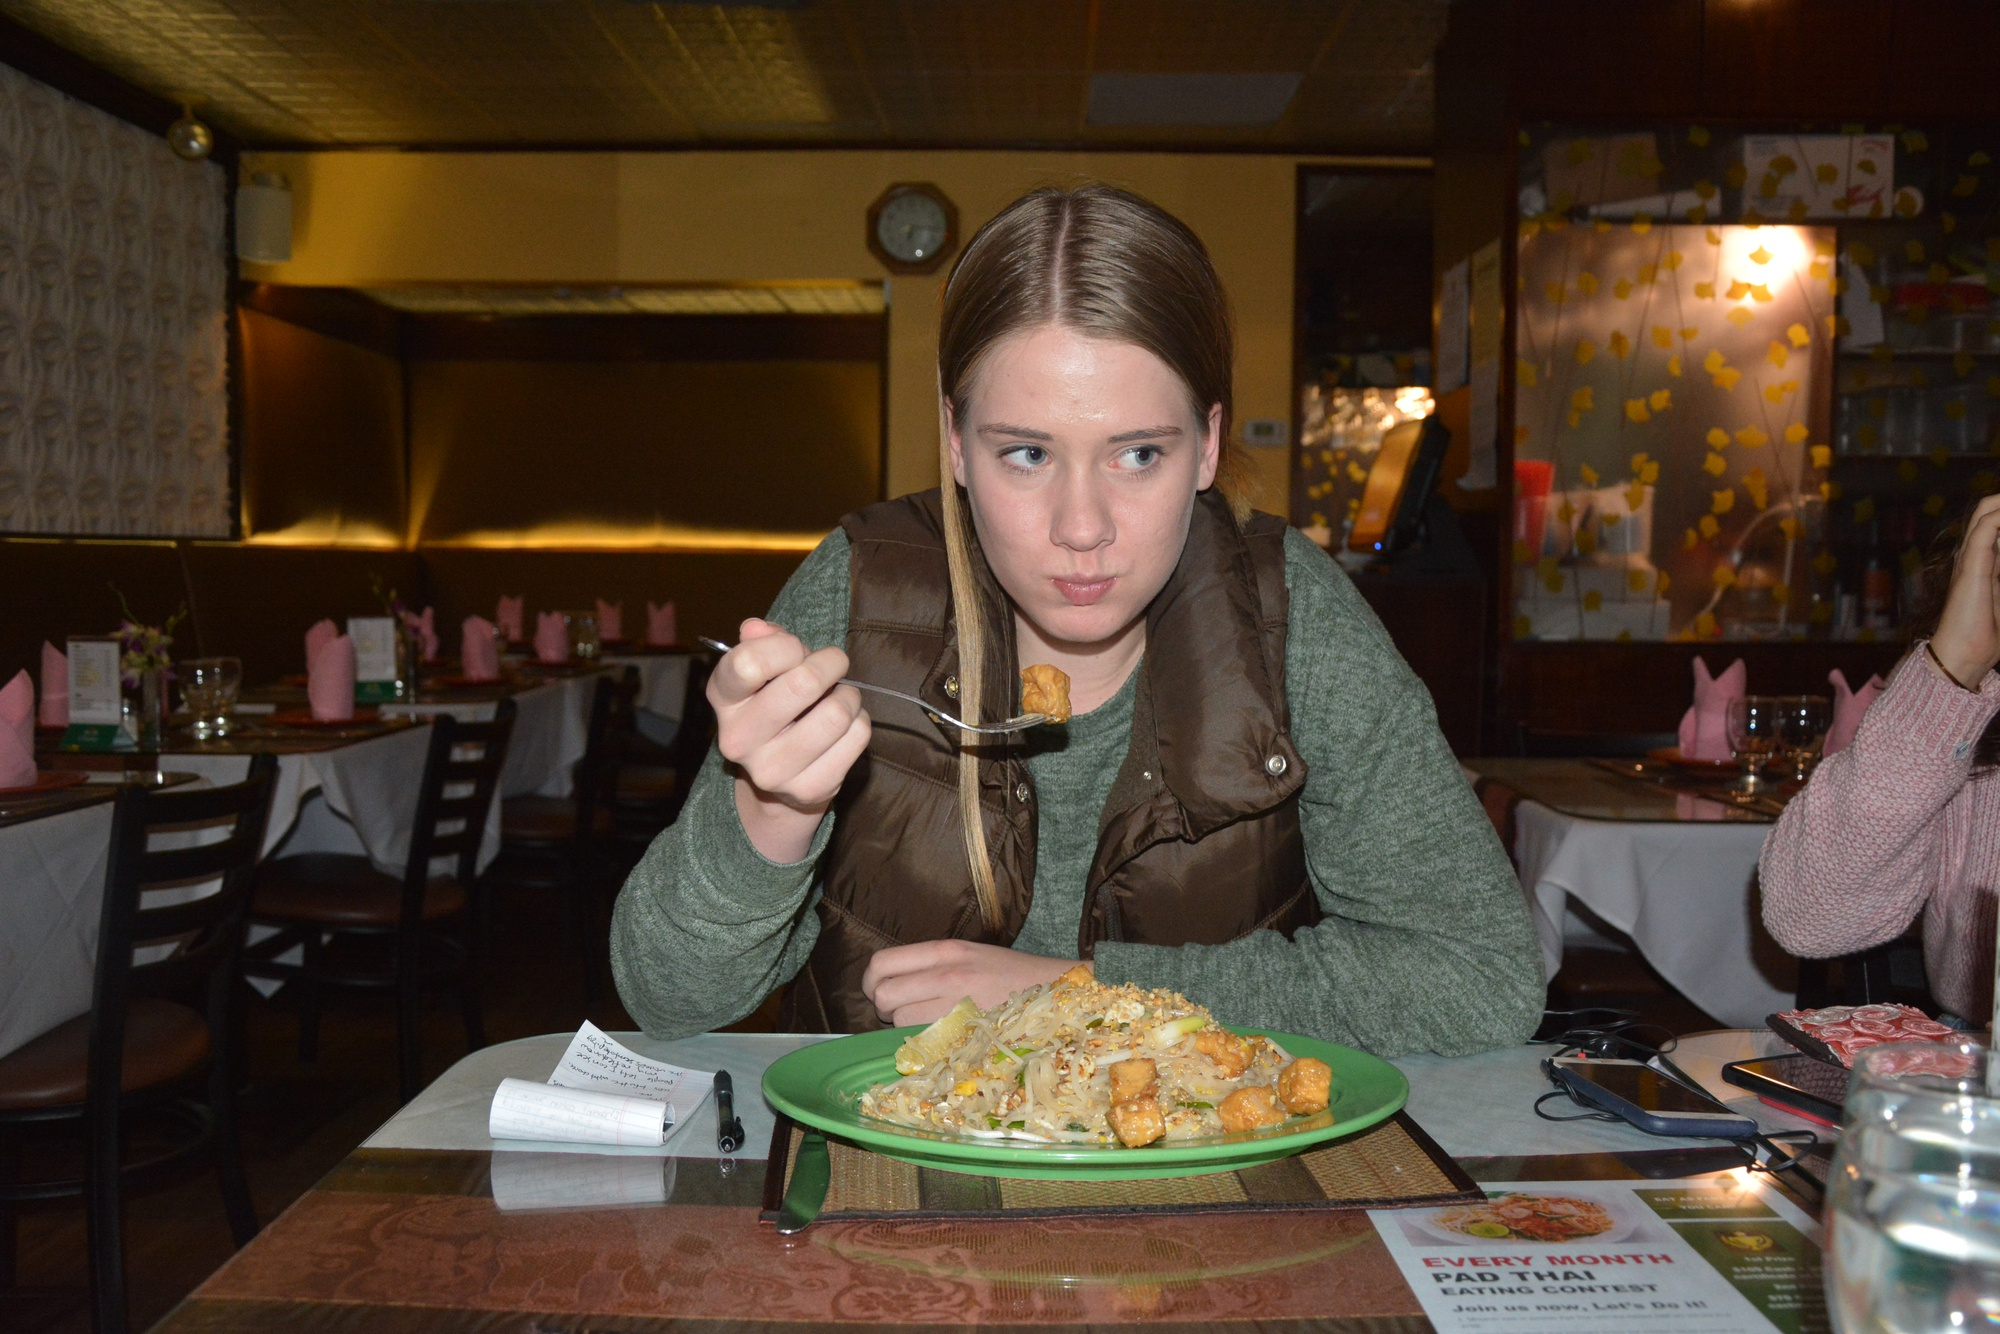 Contributing writer Trina M. Lilja '22 regrets her decision to take on the pad Thai challenge.